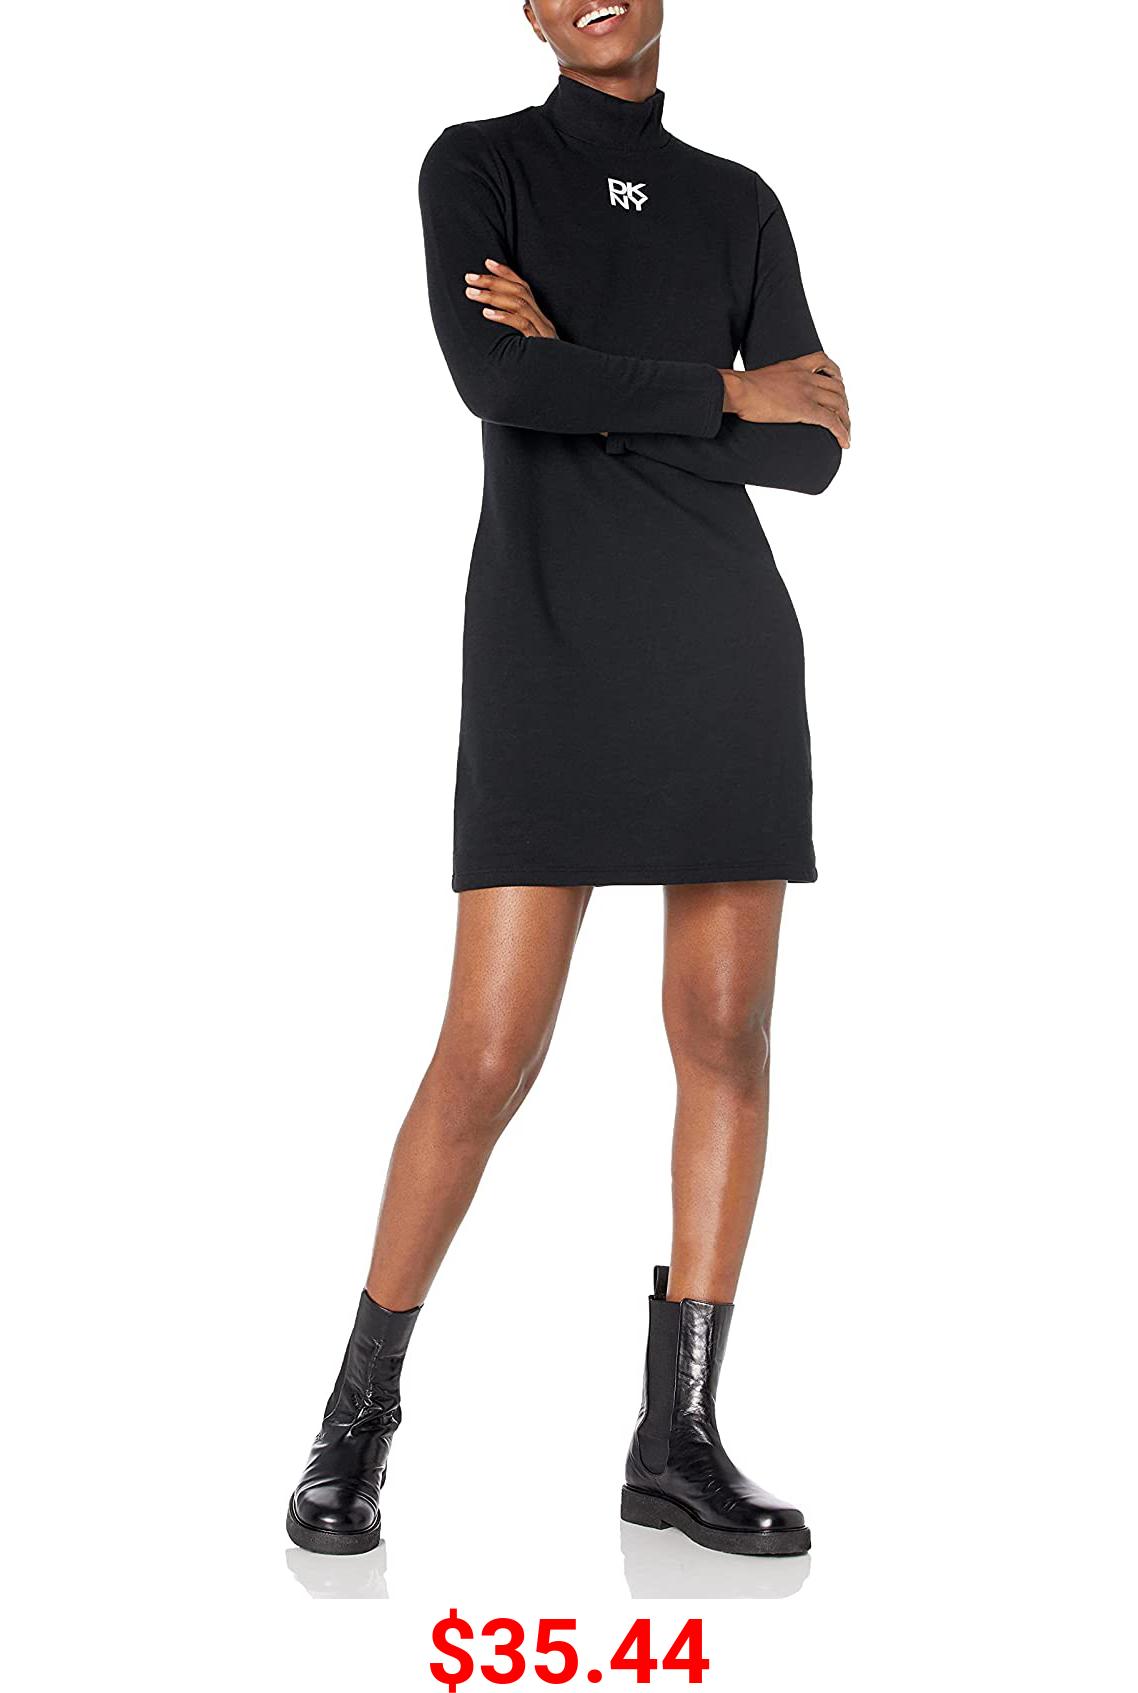 DKNY Women's T-Shirt Dress, Black Shadow Logo, X-Large